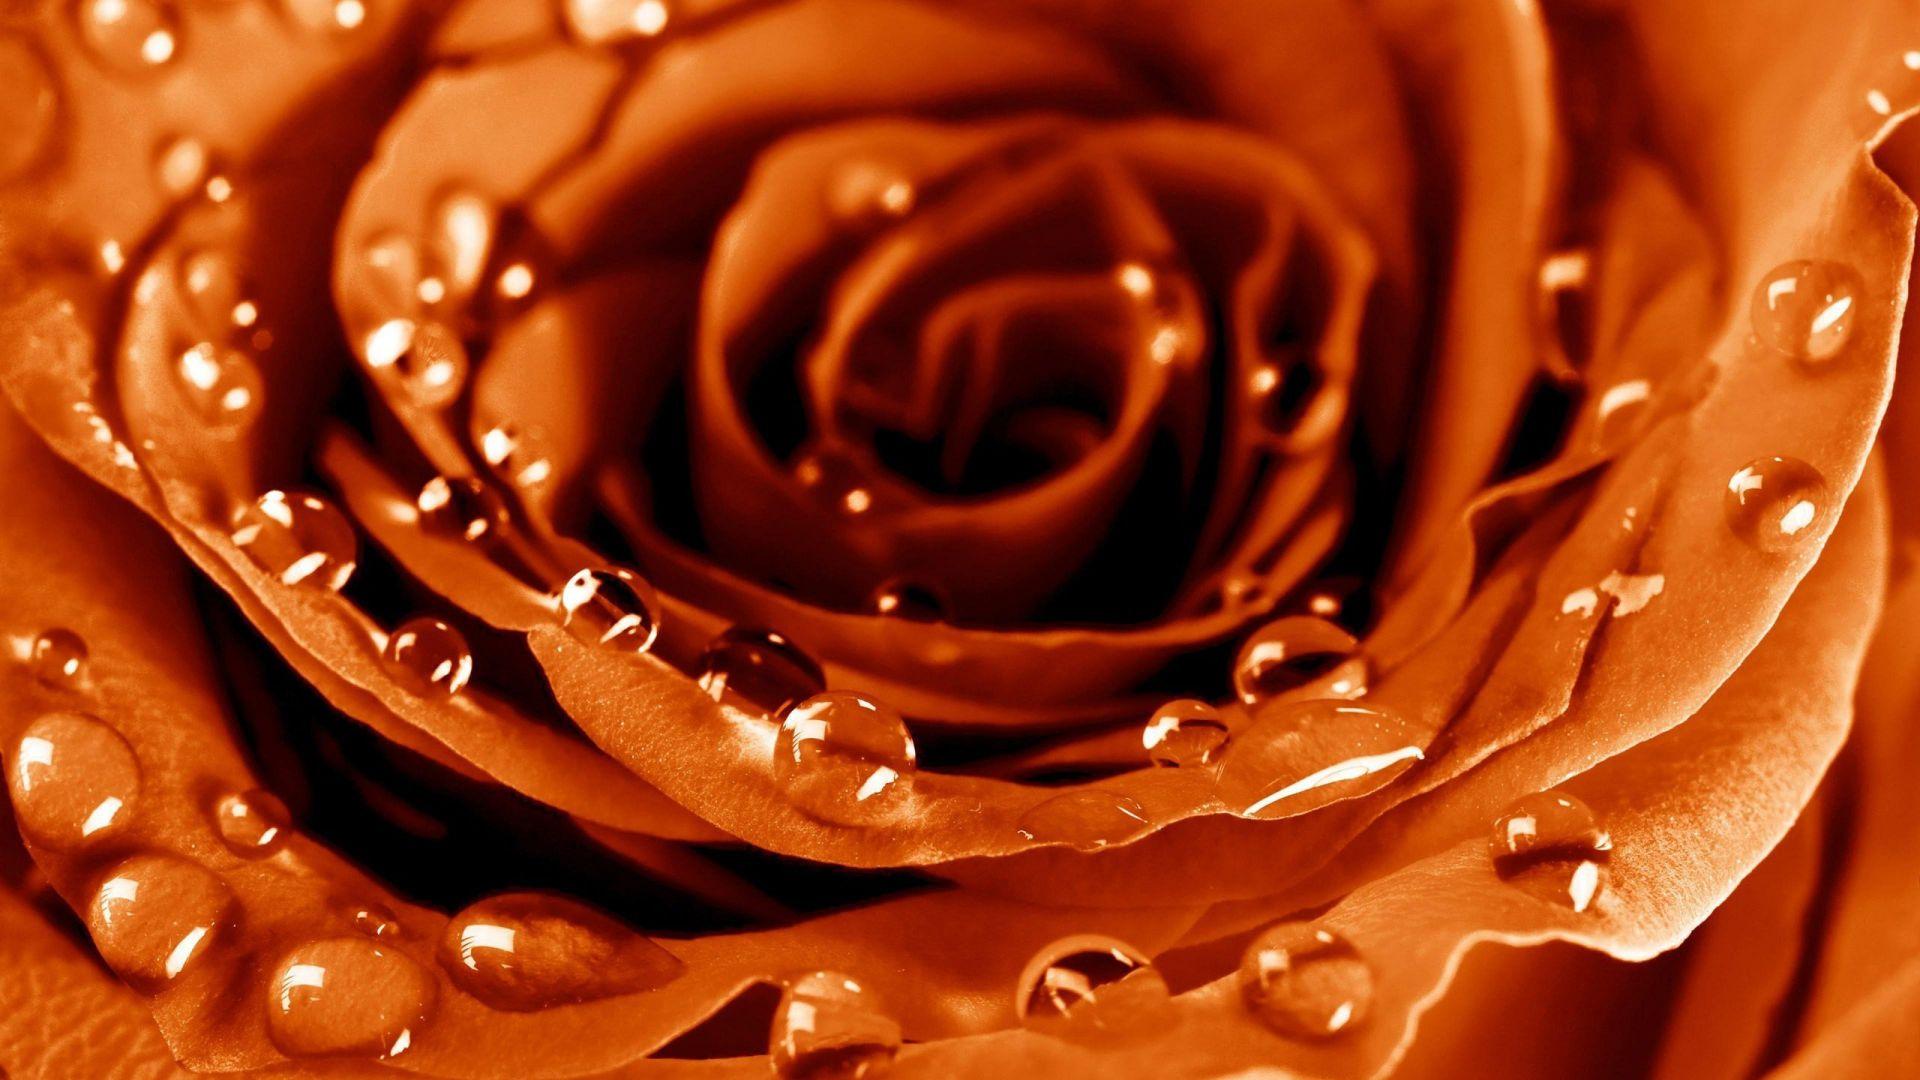 Wallpaper Rose 4k Hd Wallpaper Drops Dew Flower Nature 4700